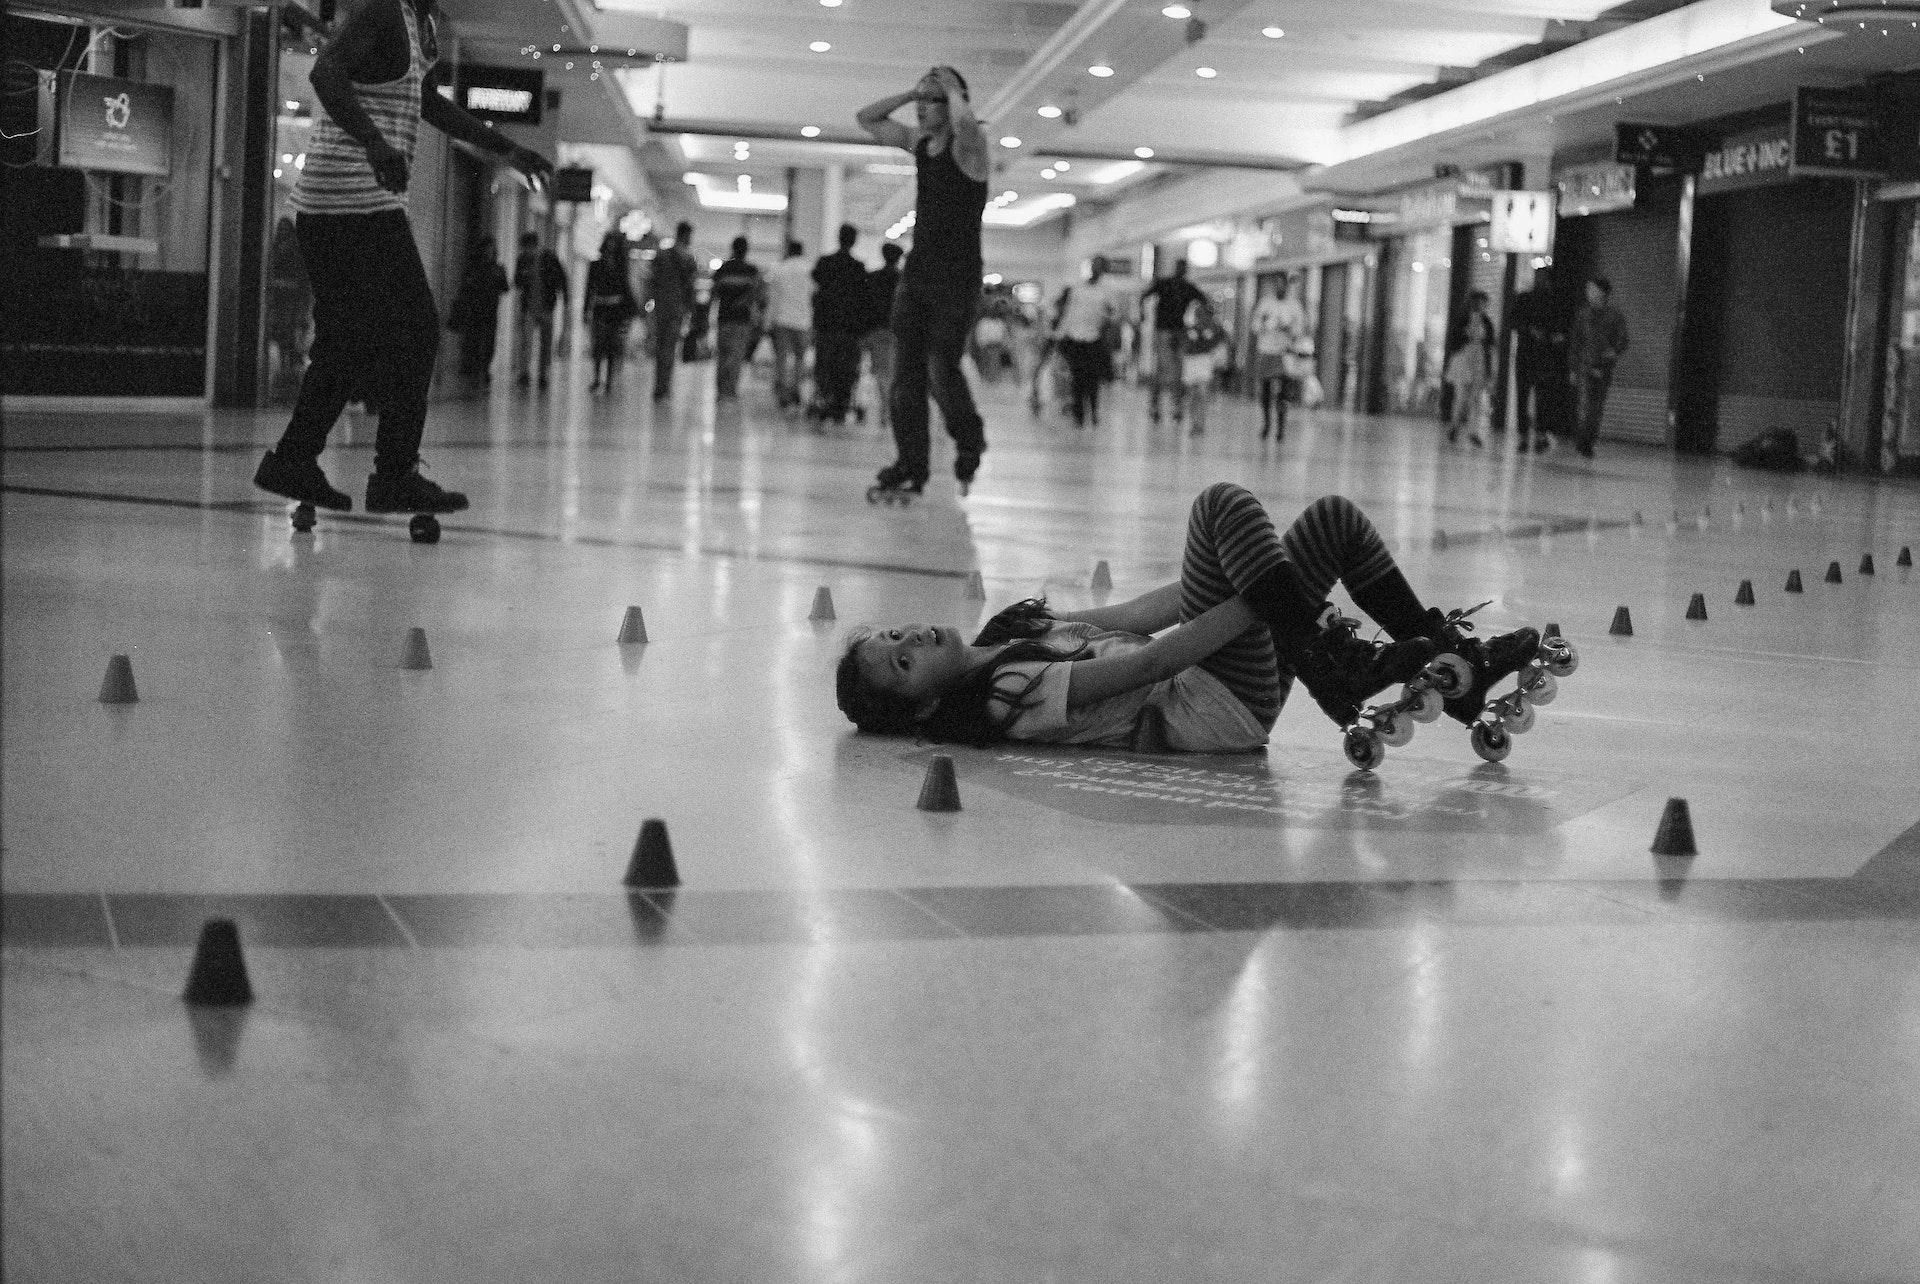 Stratford_Centre_Skaters_Lighter-14